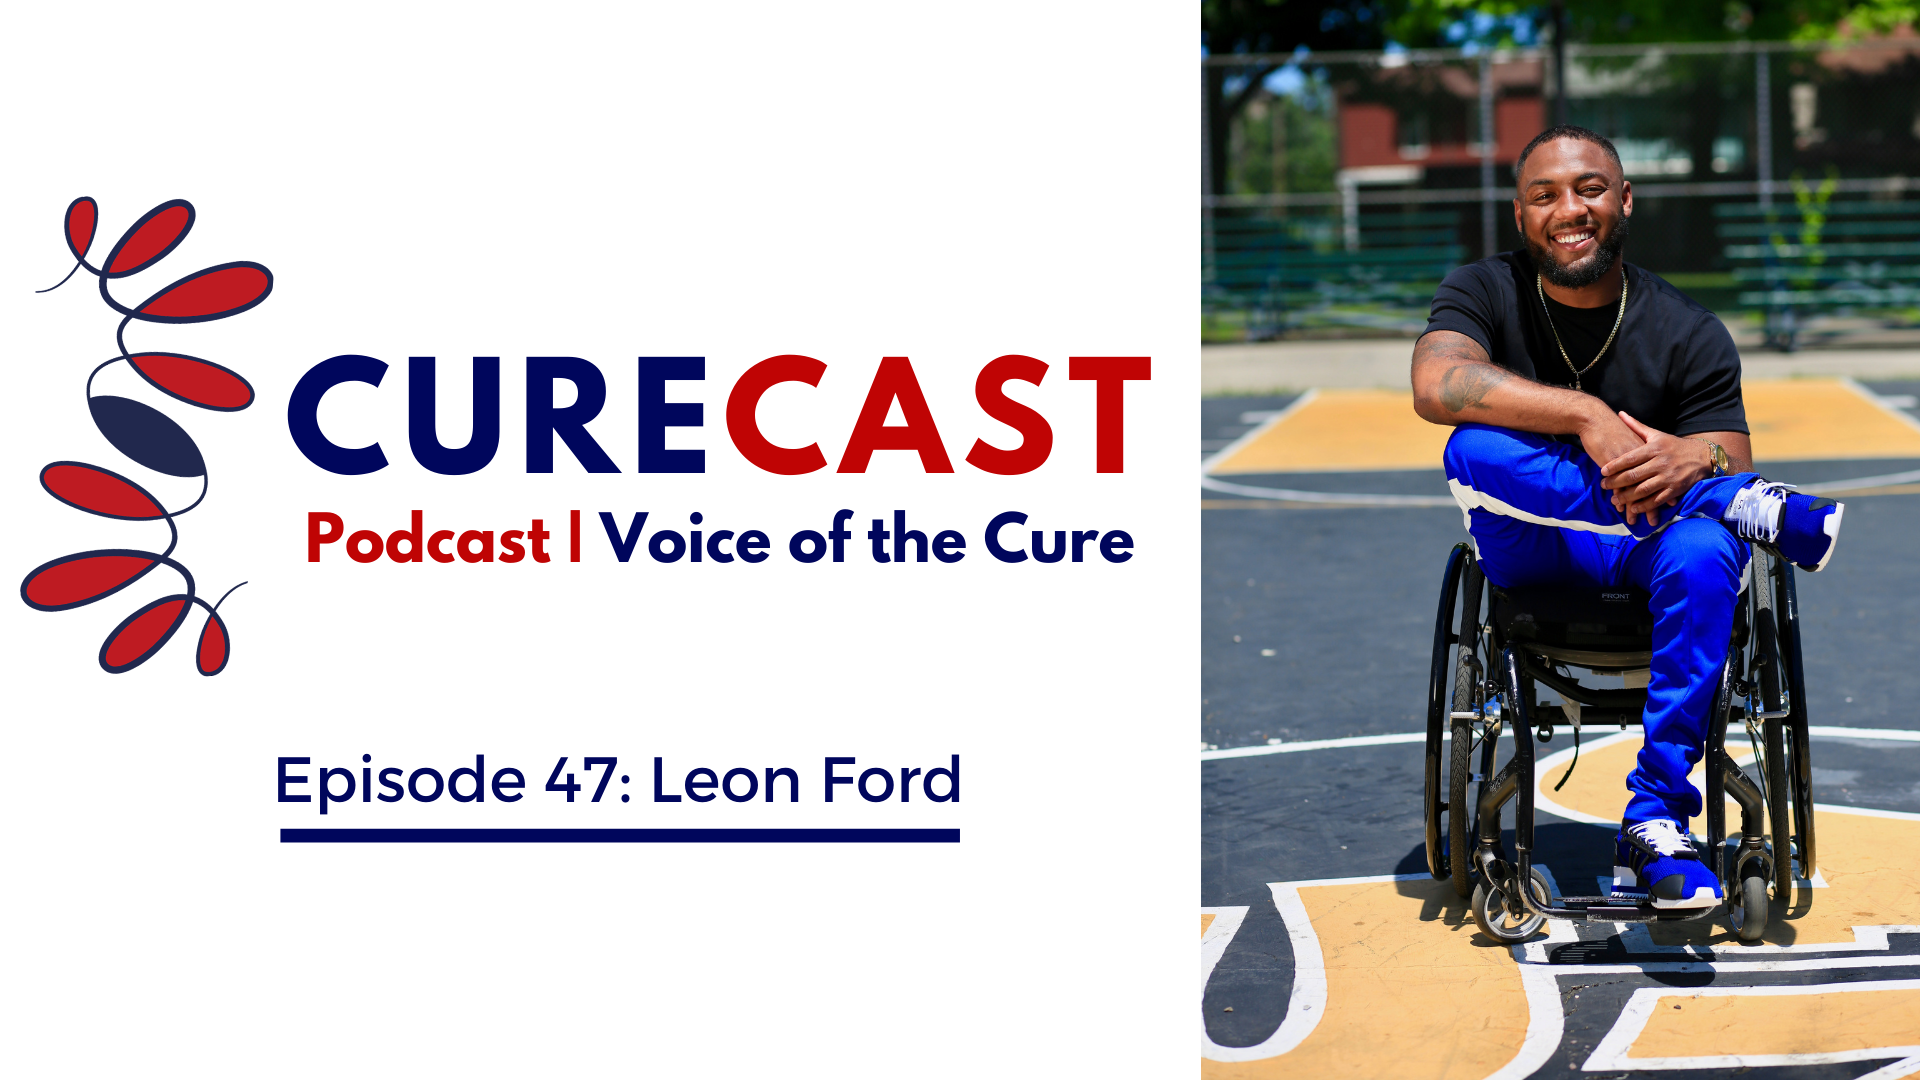 CureCast Episode 47: Leon Ford